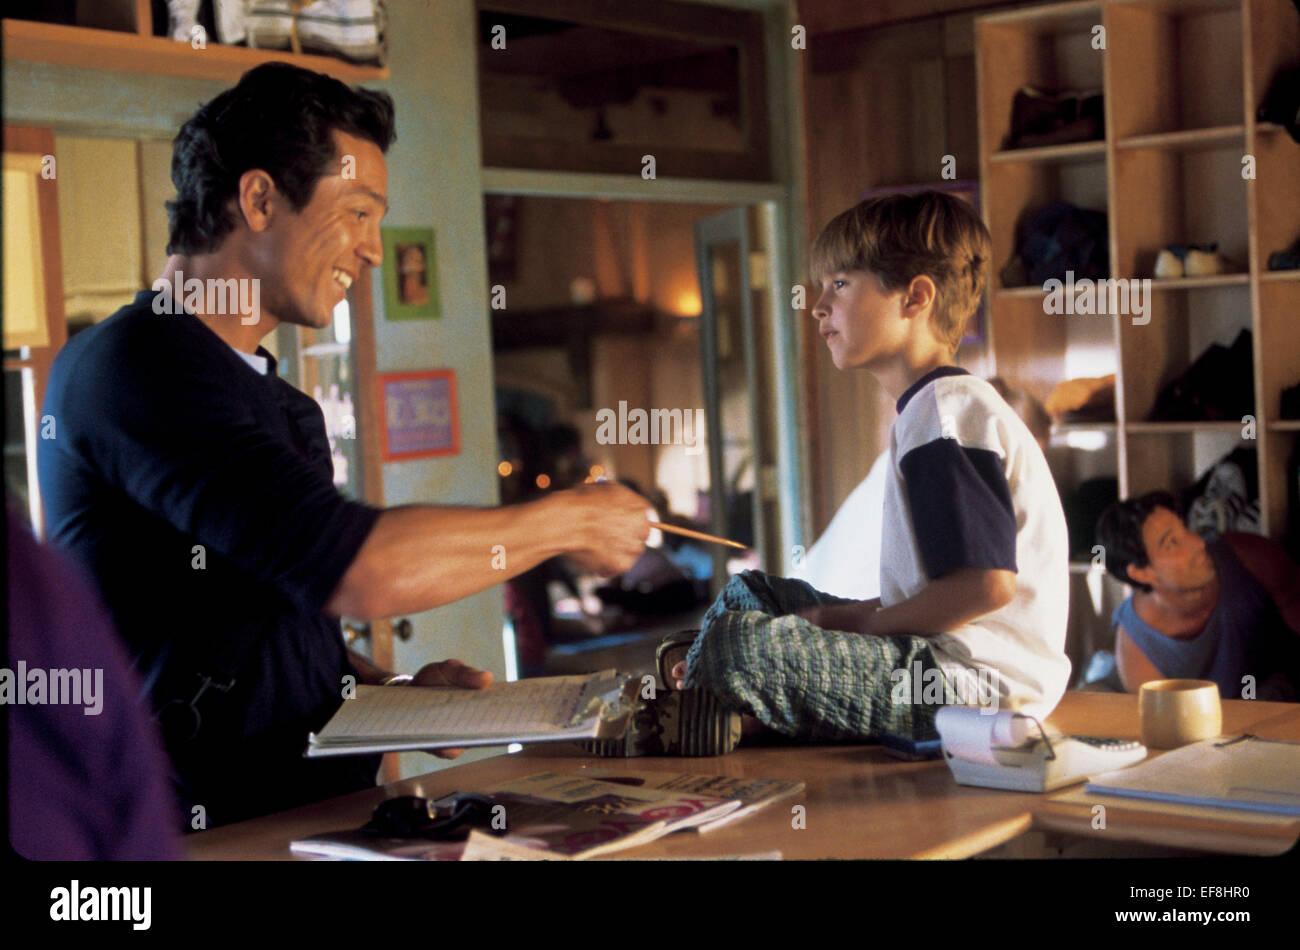 BENJAMIN BRATT & MALCOLM STUMPF THE NEXT BEST THING (2000) Stock Photo